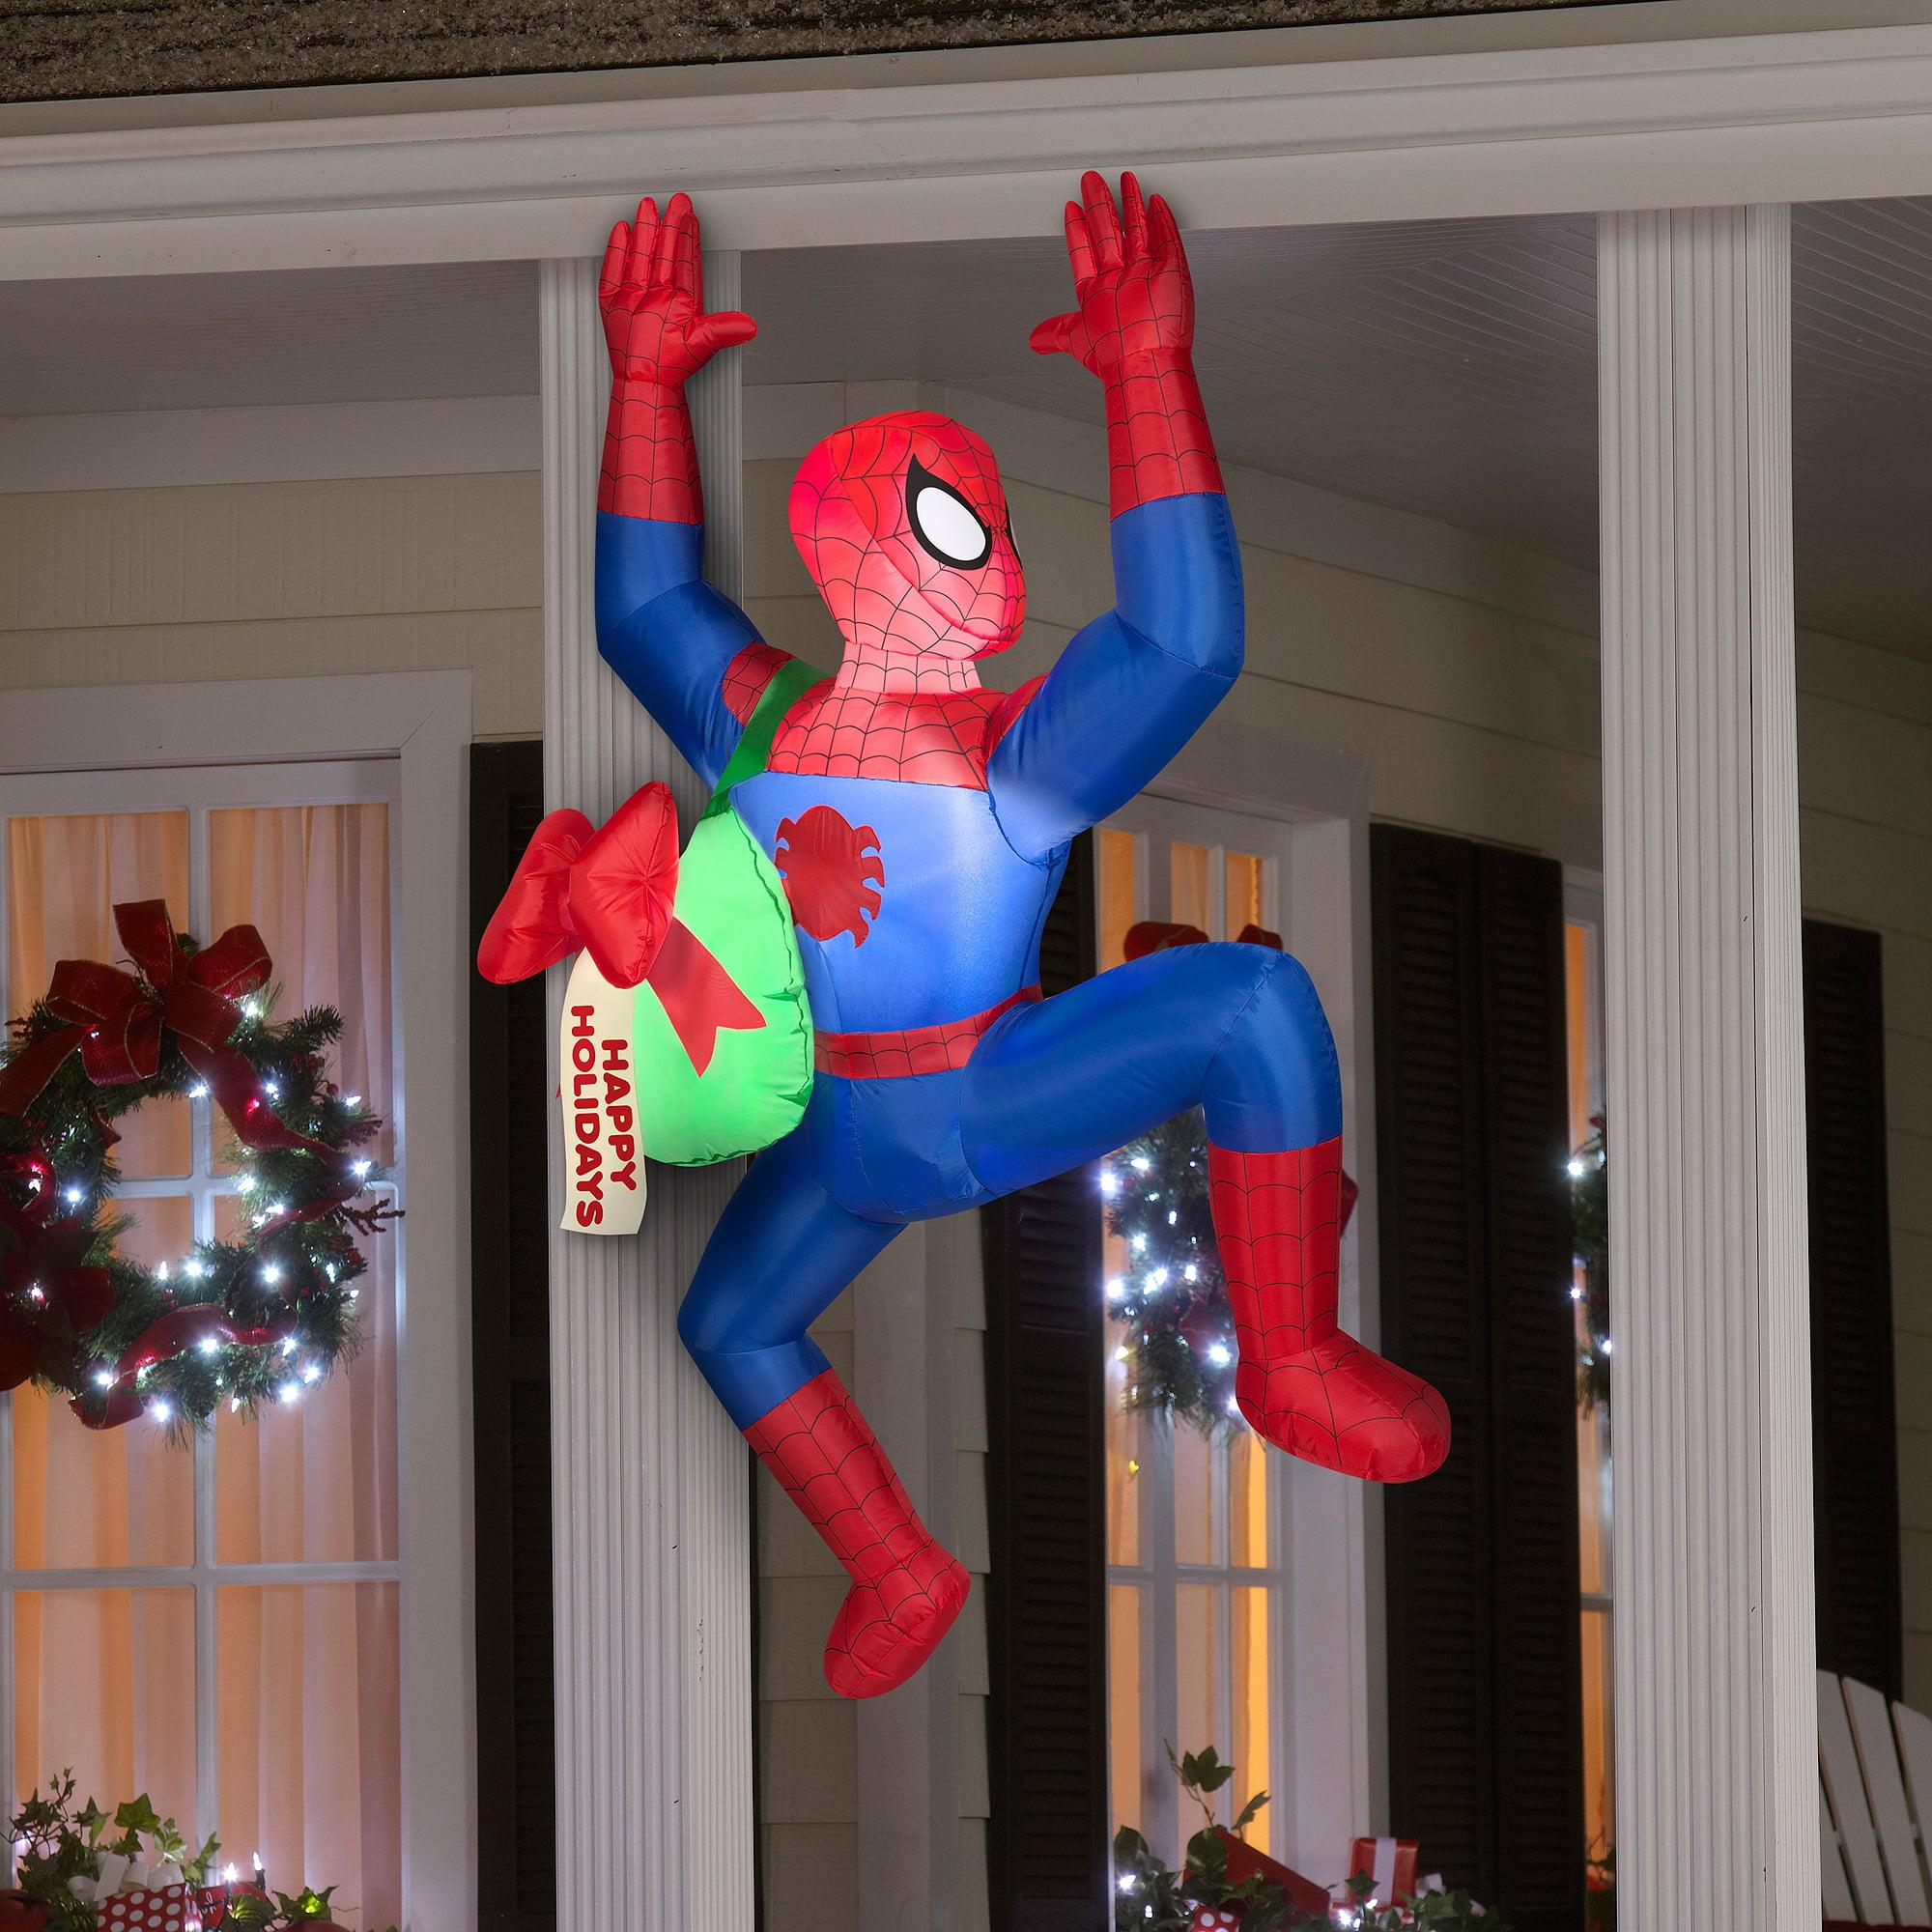 Airblown Inflatable 5' Spiderman Christmas Prop - Walmart.com